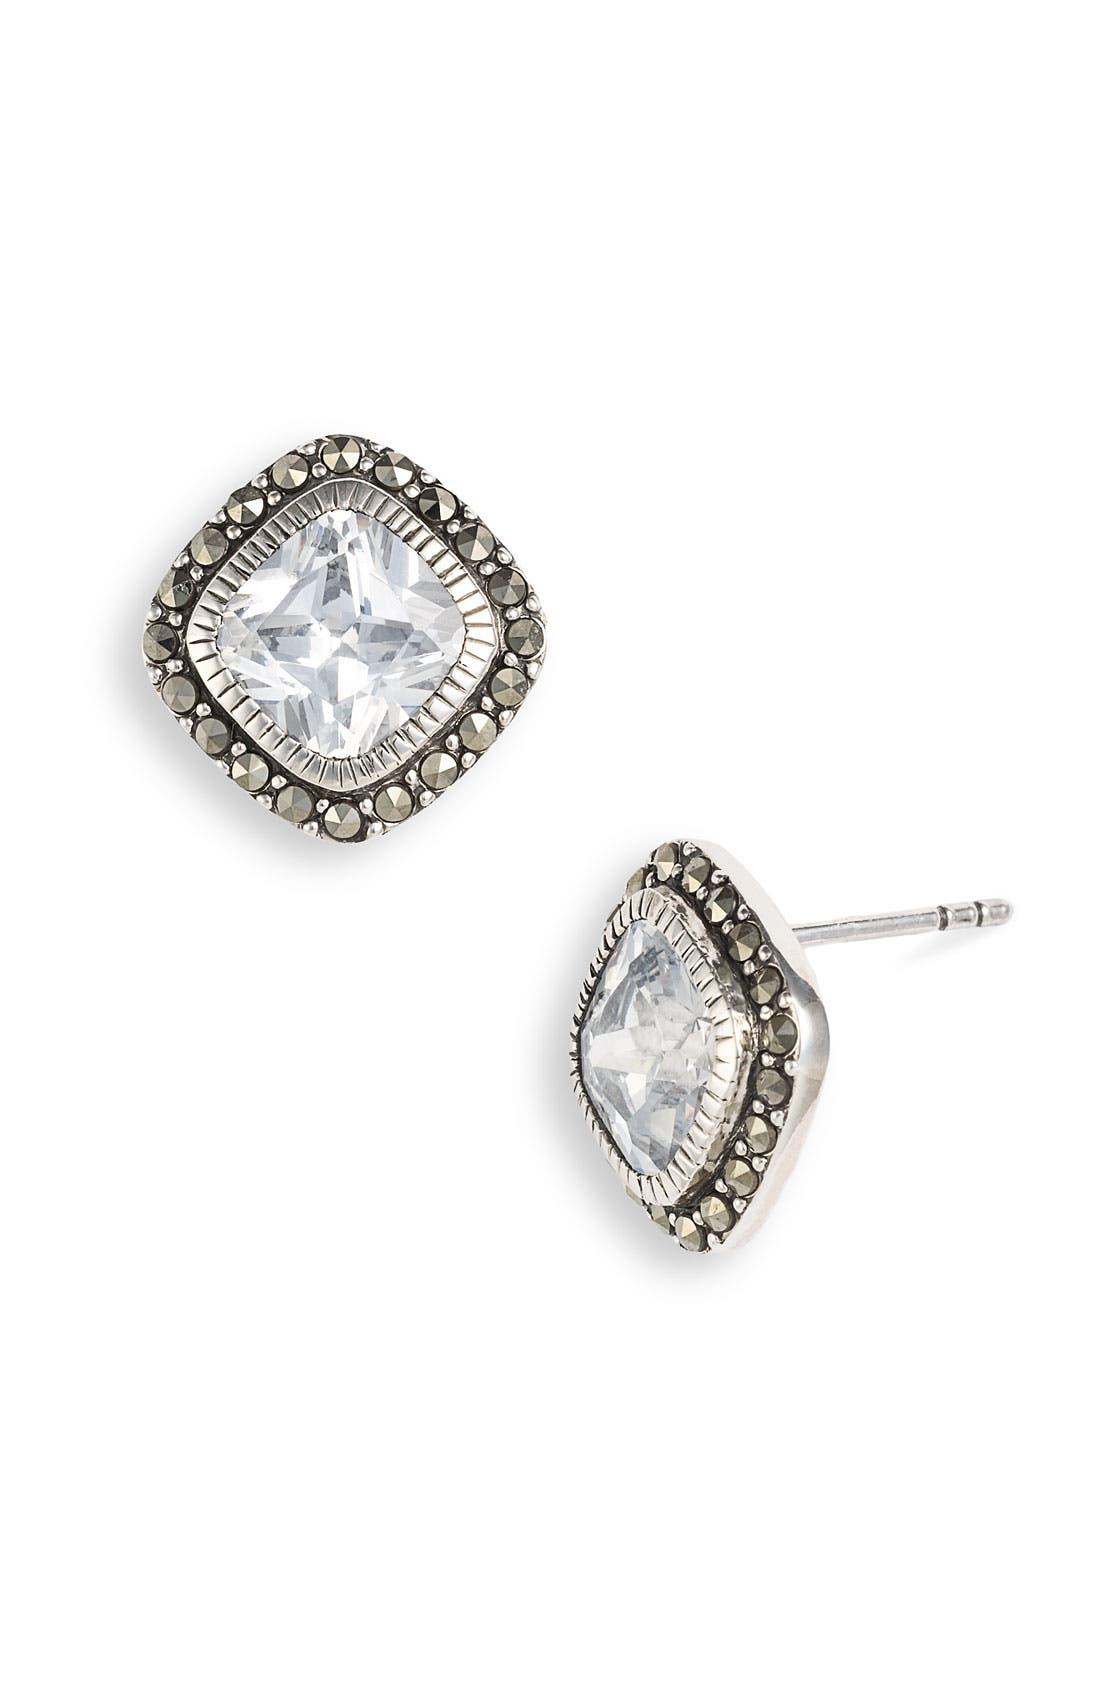 Main Image - Judith Jack 'Aquarius' Button Stud Earrings